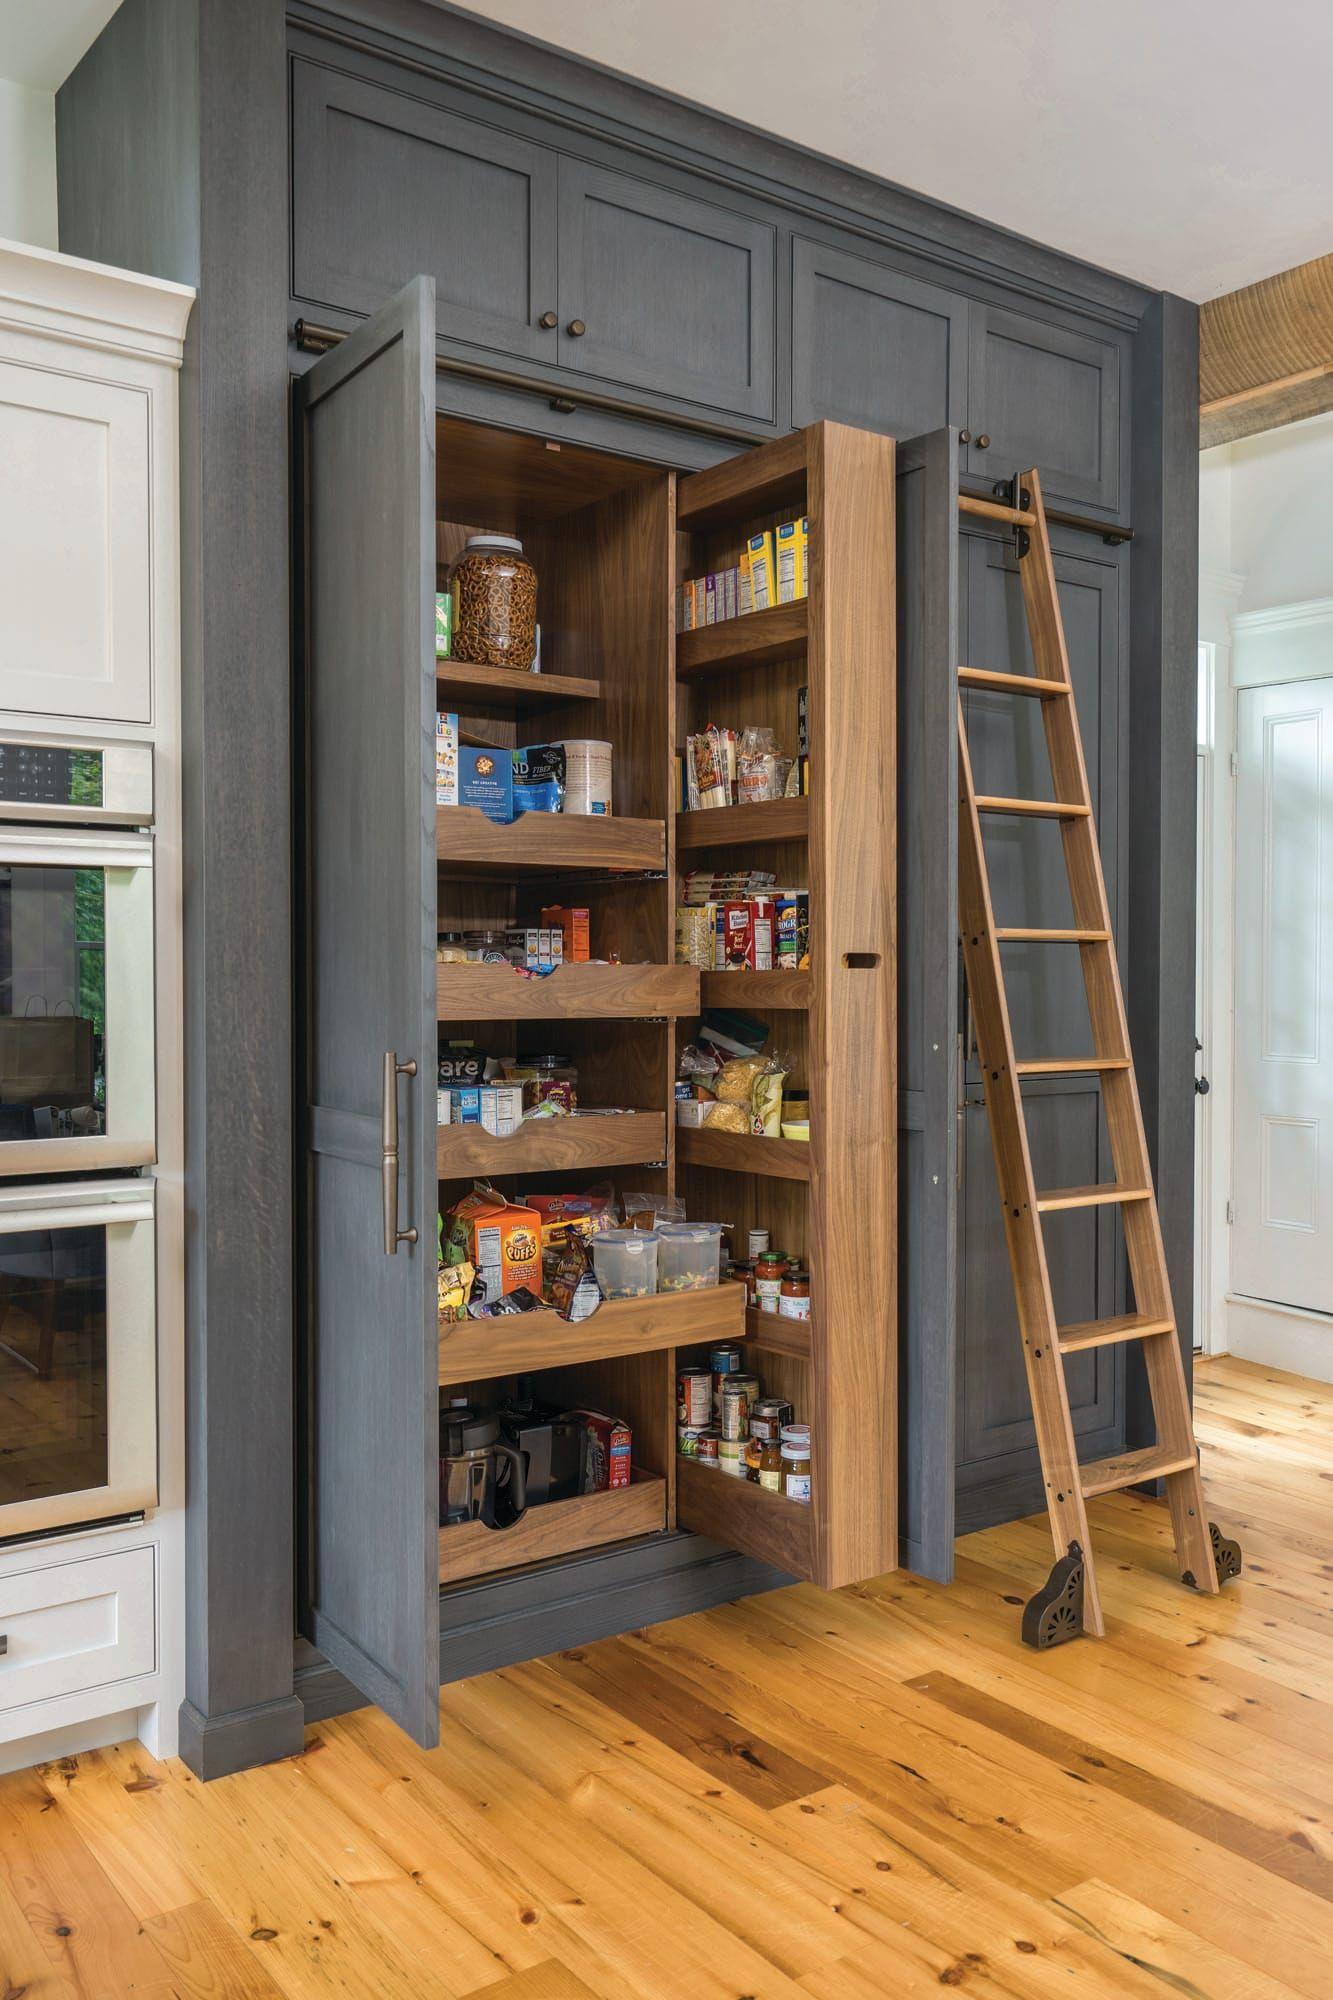 Designing a Functional & Beautiful Kitchen